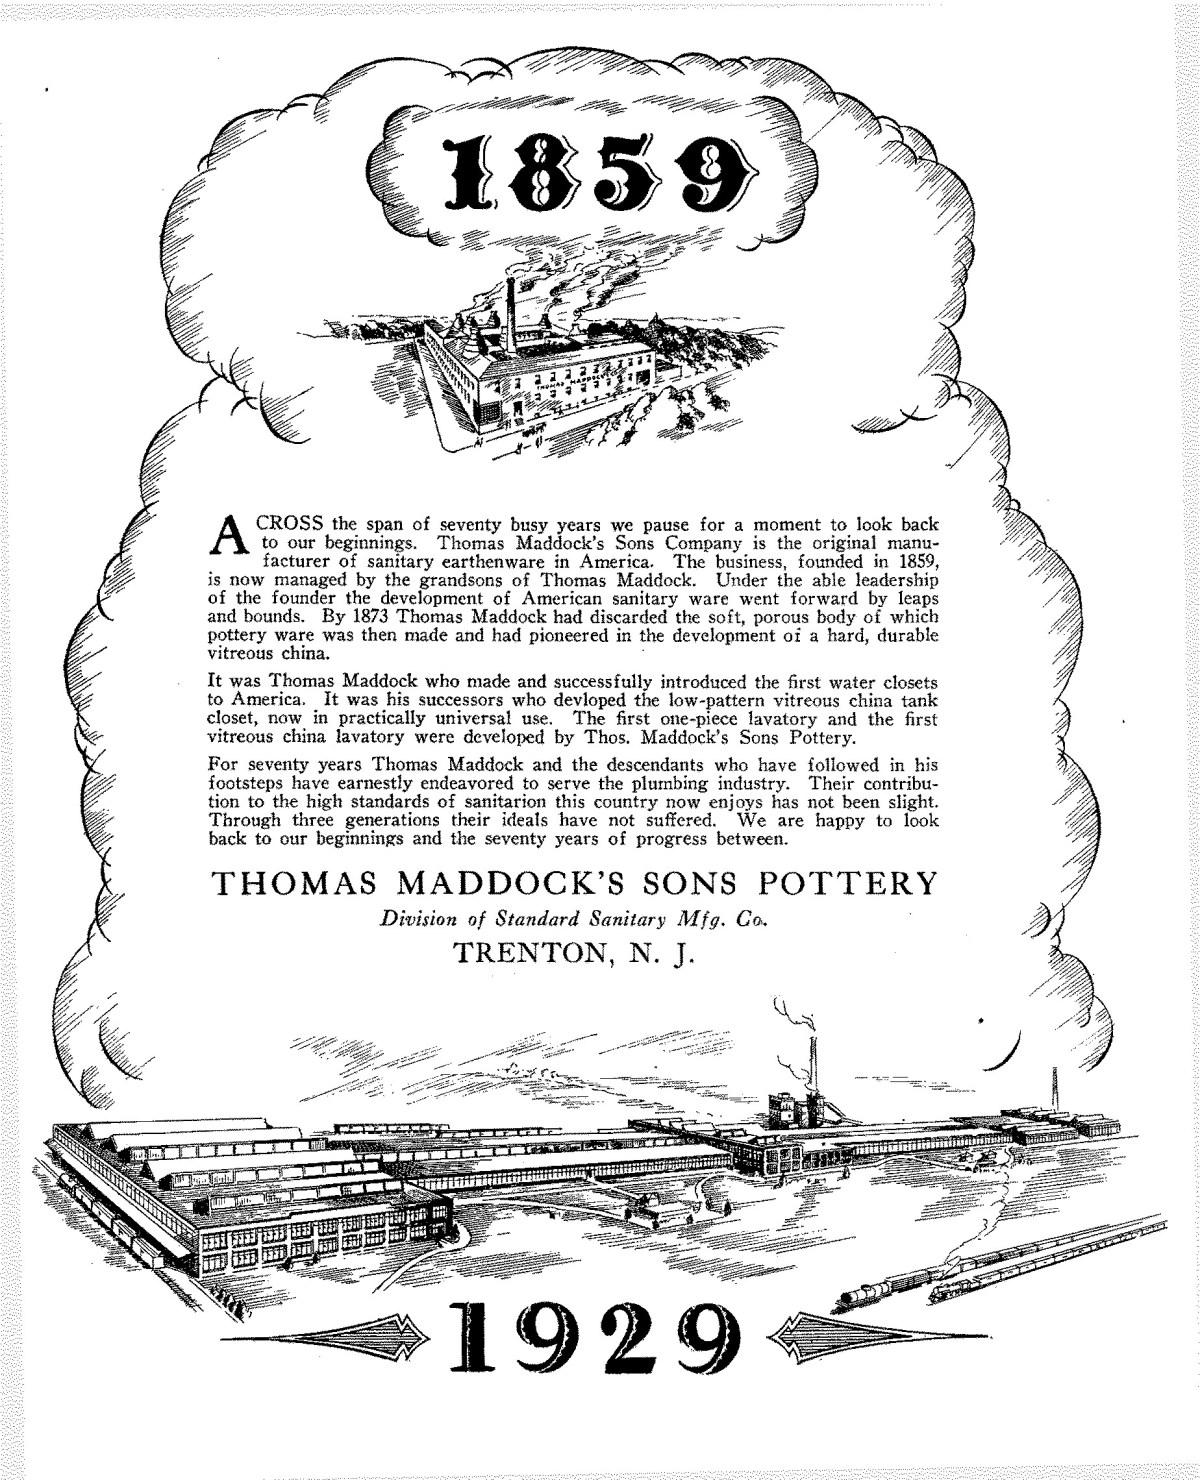 Thomas Maddock's Sons Pottery Advertisement